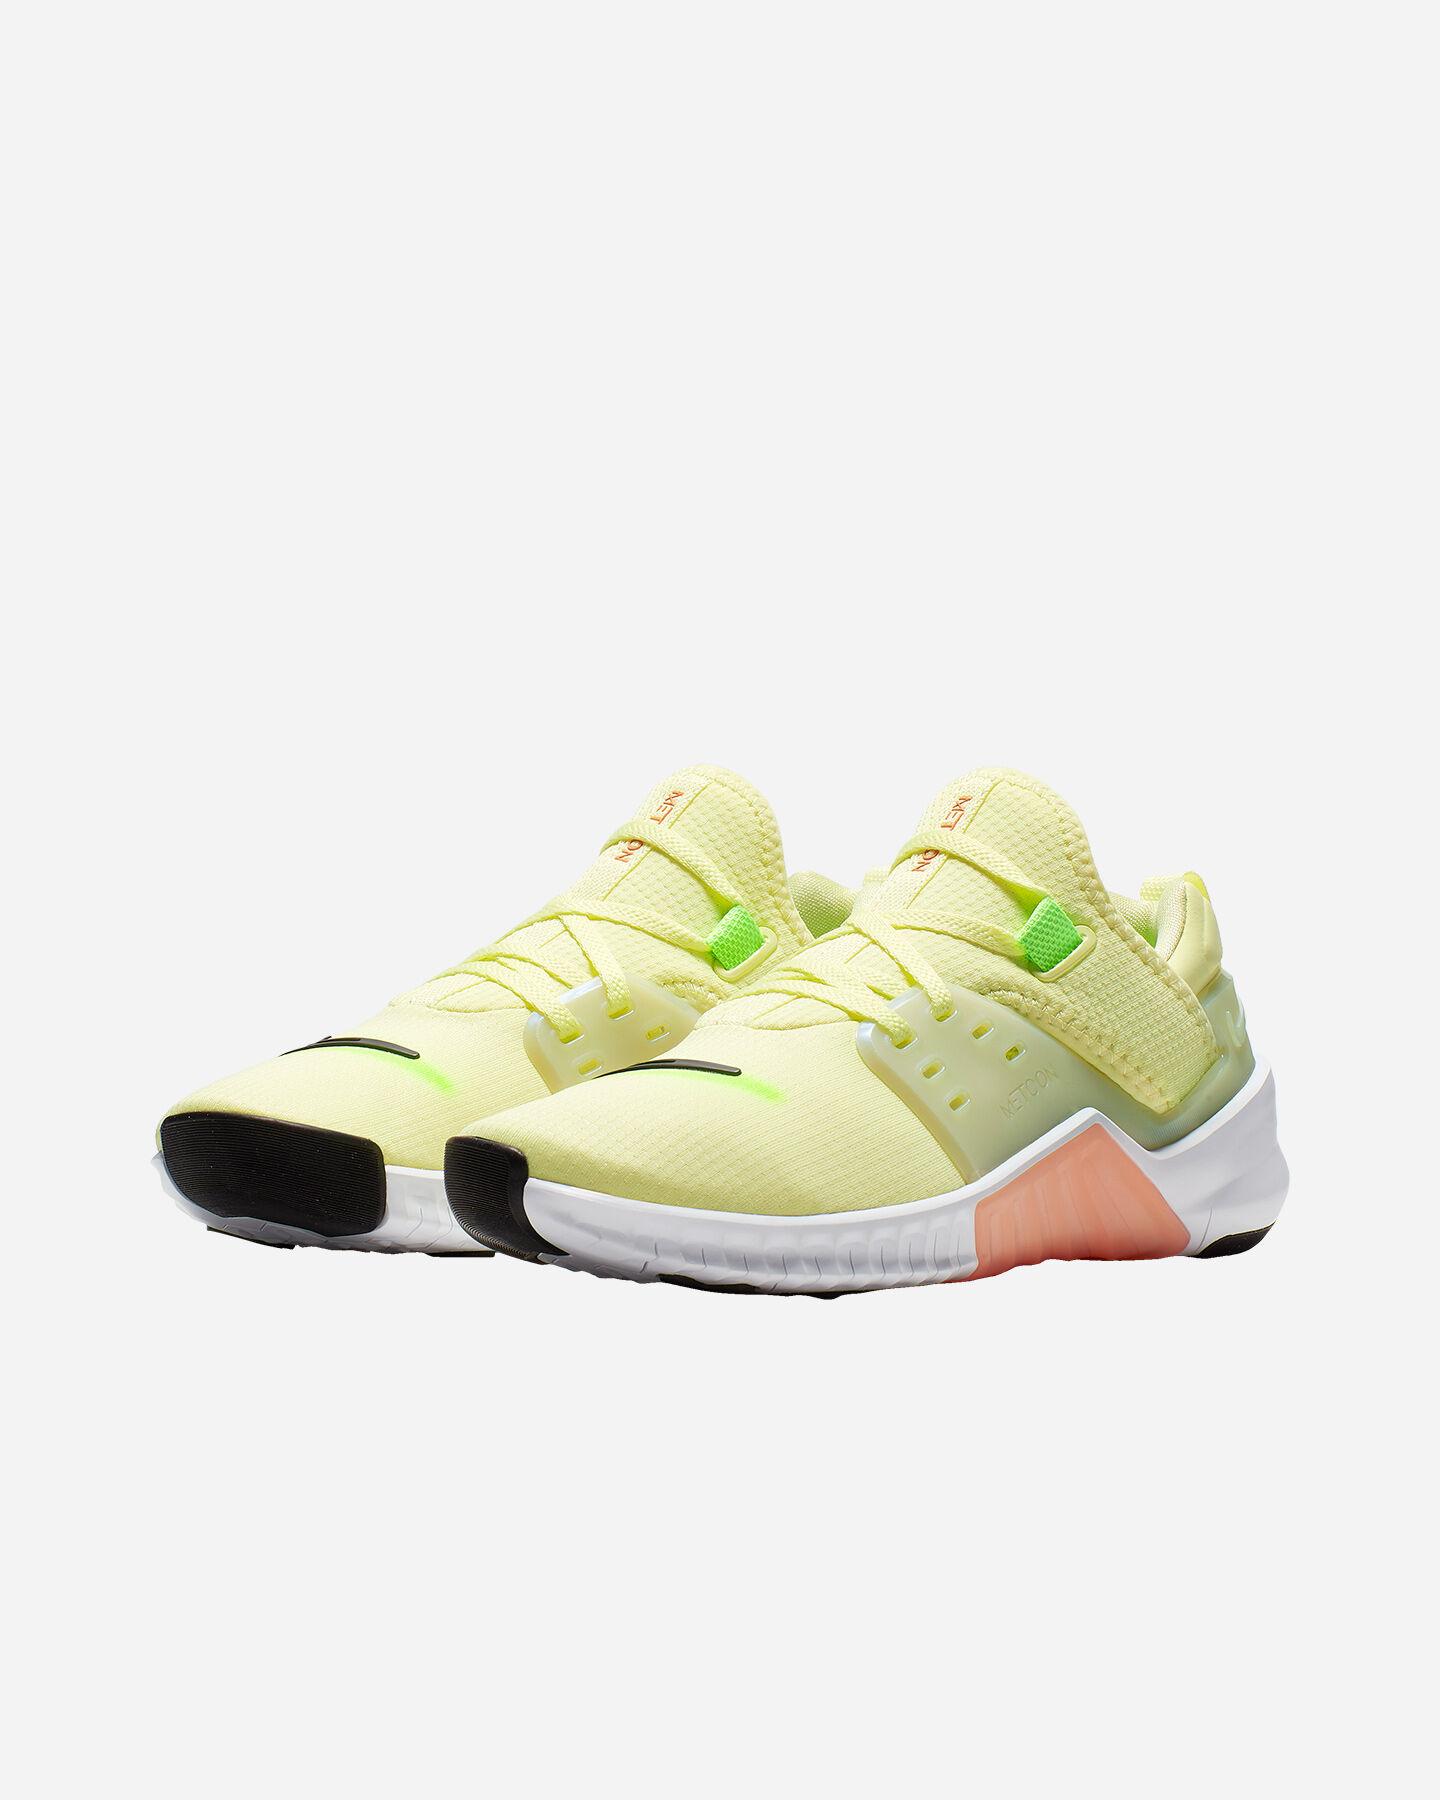 Scarpe Sportive Nike Free Metcon 2 Amp W CI1753 301  66KlCc